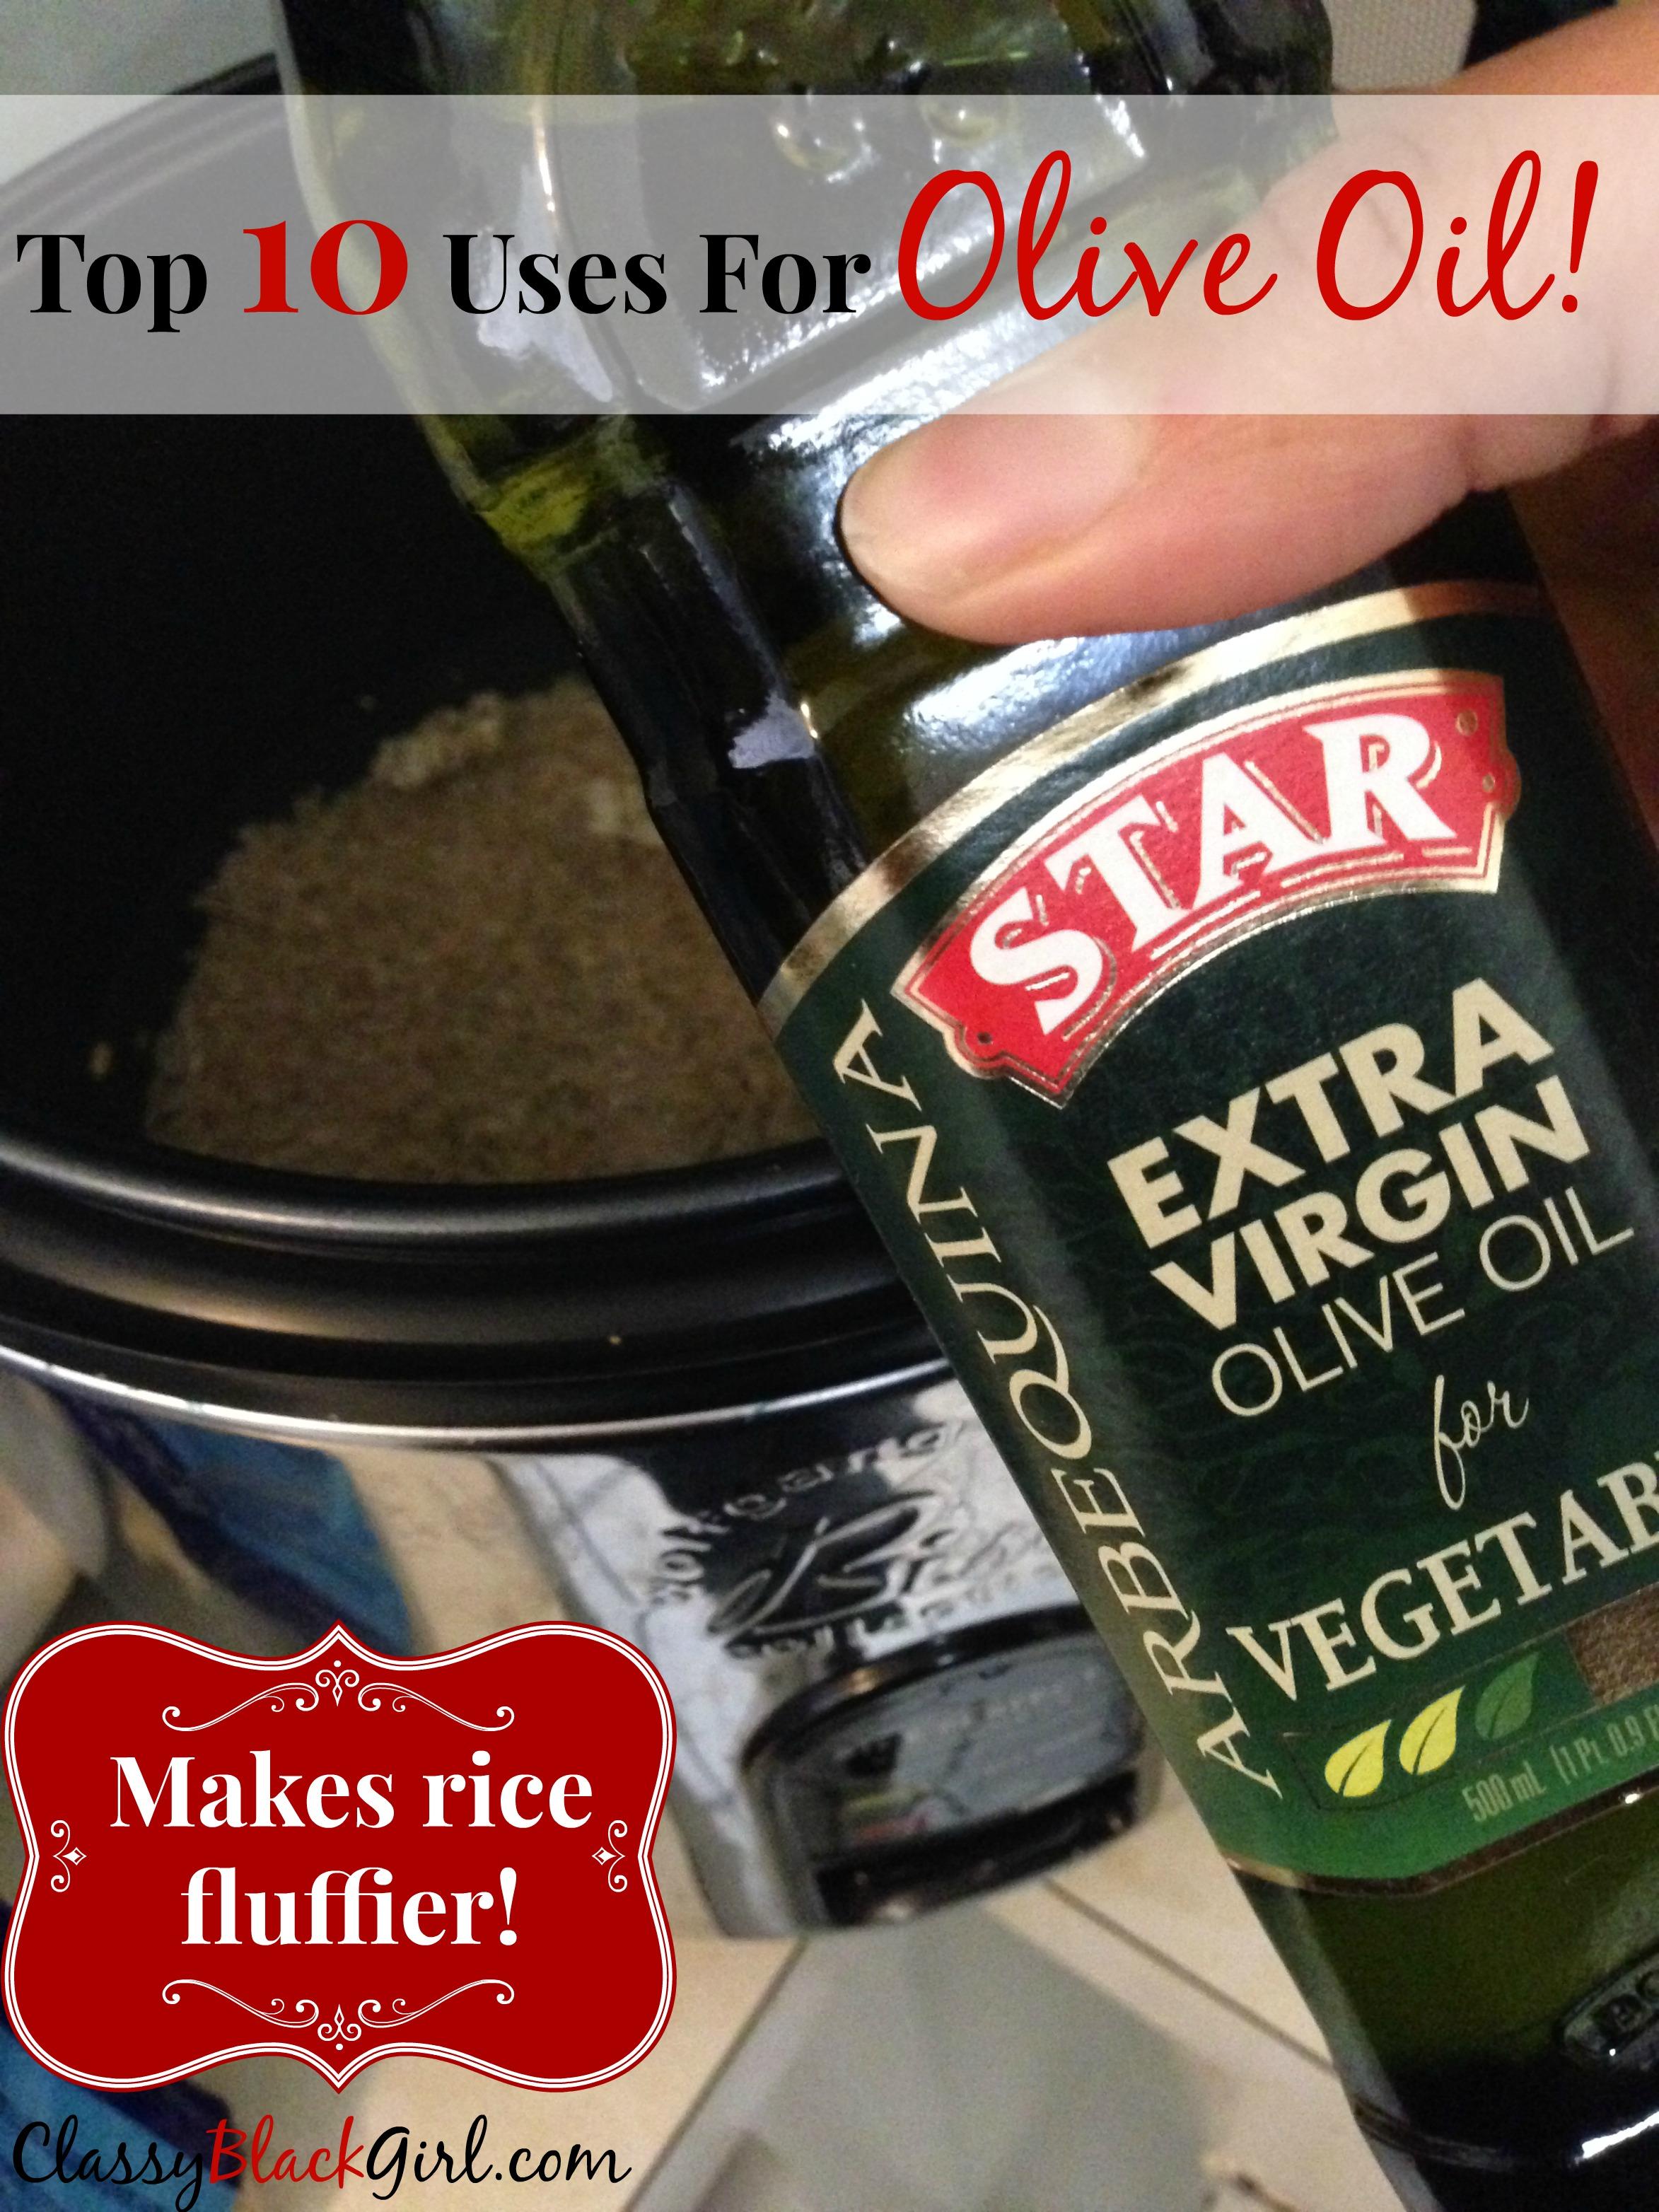 #StarOliveOil #shop #cbias OliveOil Makes Rice Fluffier ClassyBlackGirl